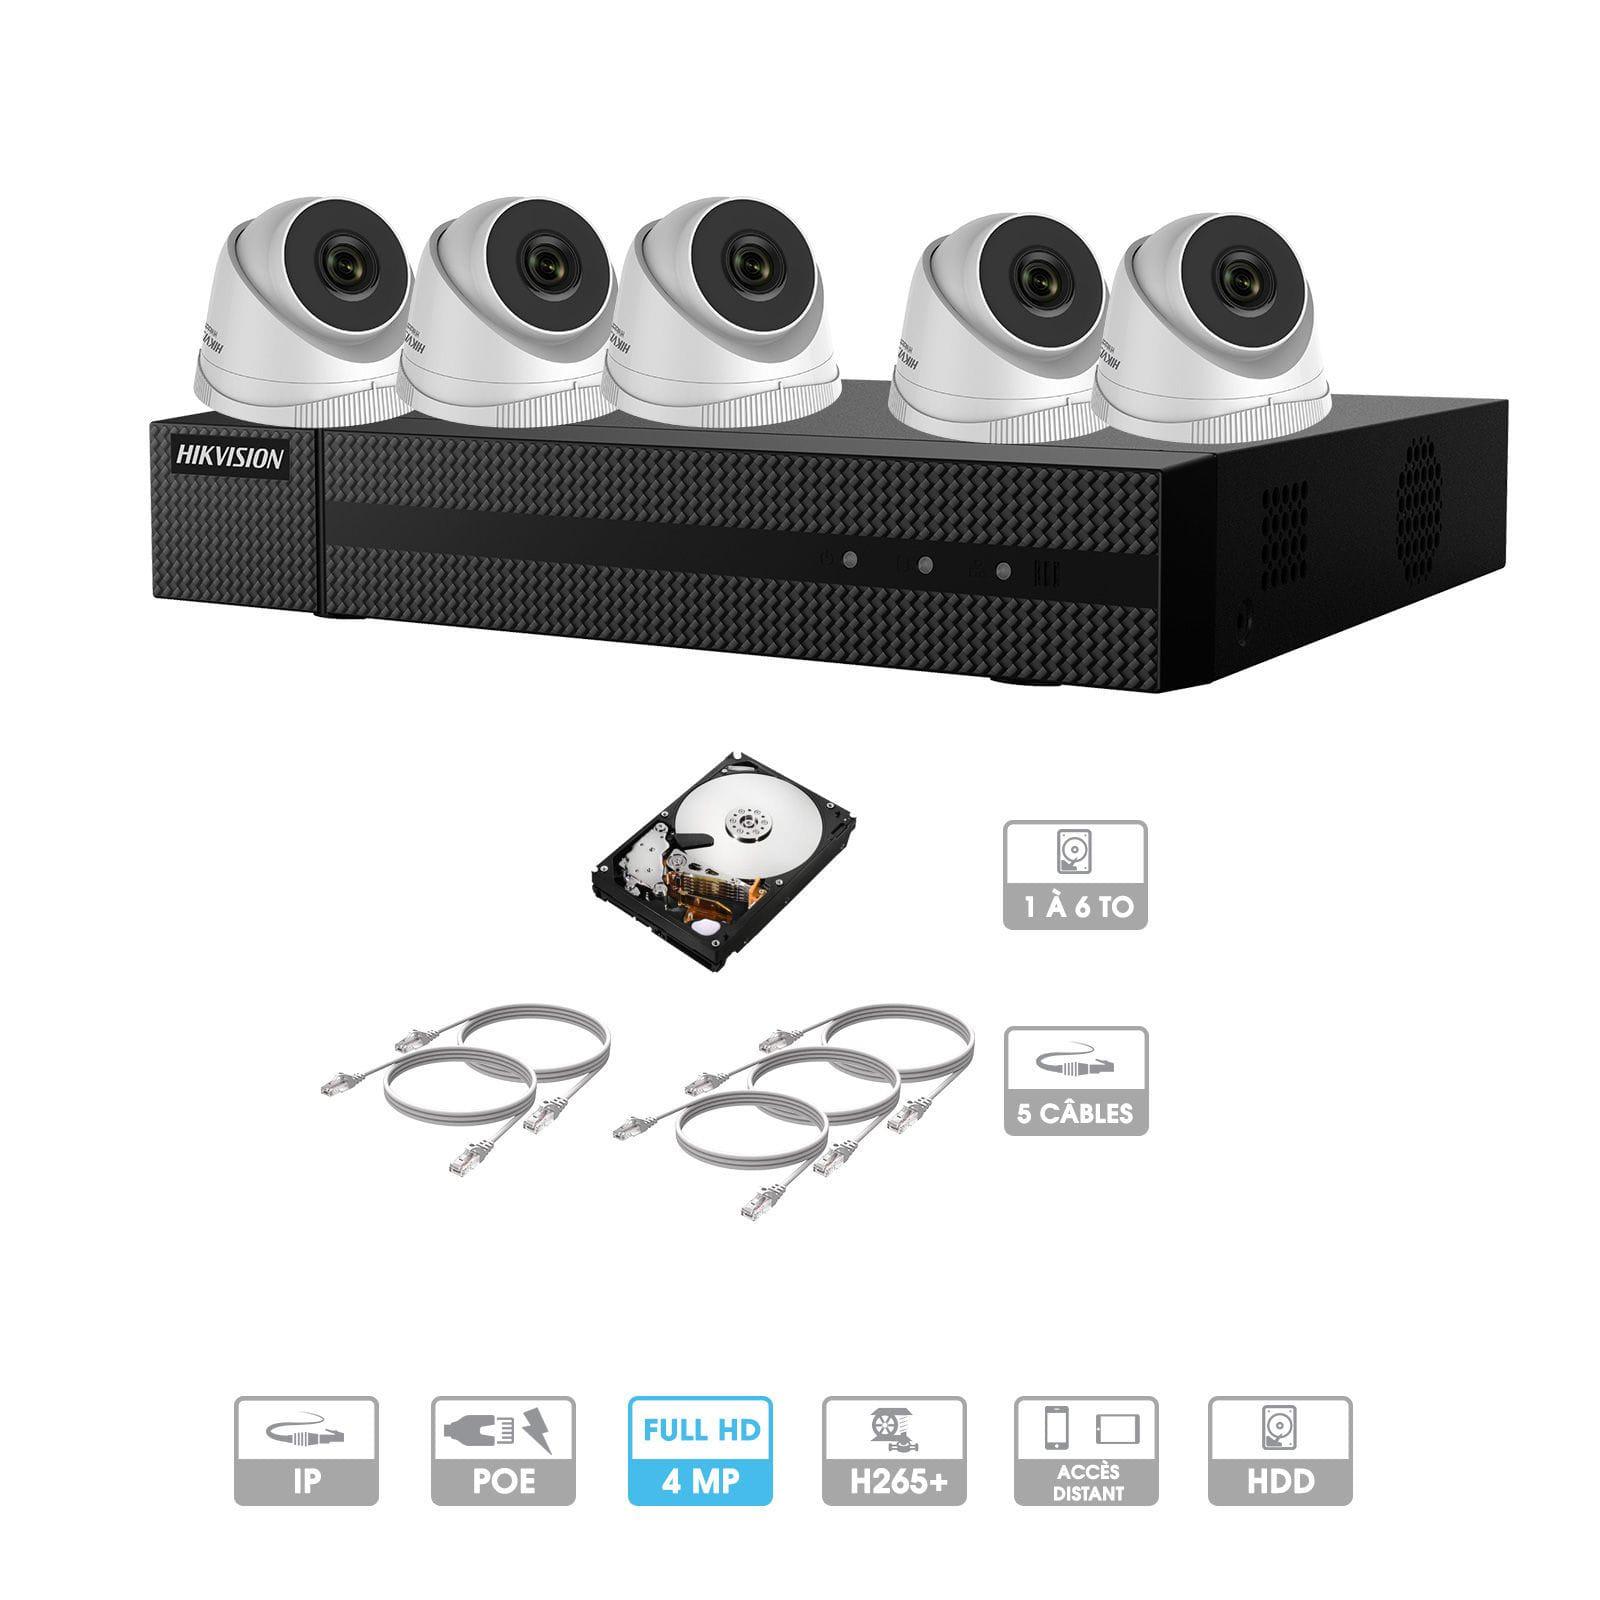 Kit vidéosurveillance 5 caméras | 4 MP | IP PoE | 5 câbles RJ45 20/30/40/50 mètres | HDD 1 à 6 To | Dôme Hiwatch